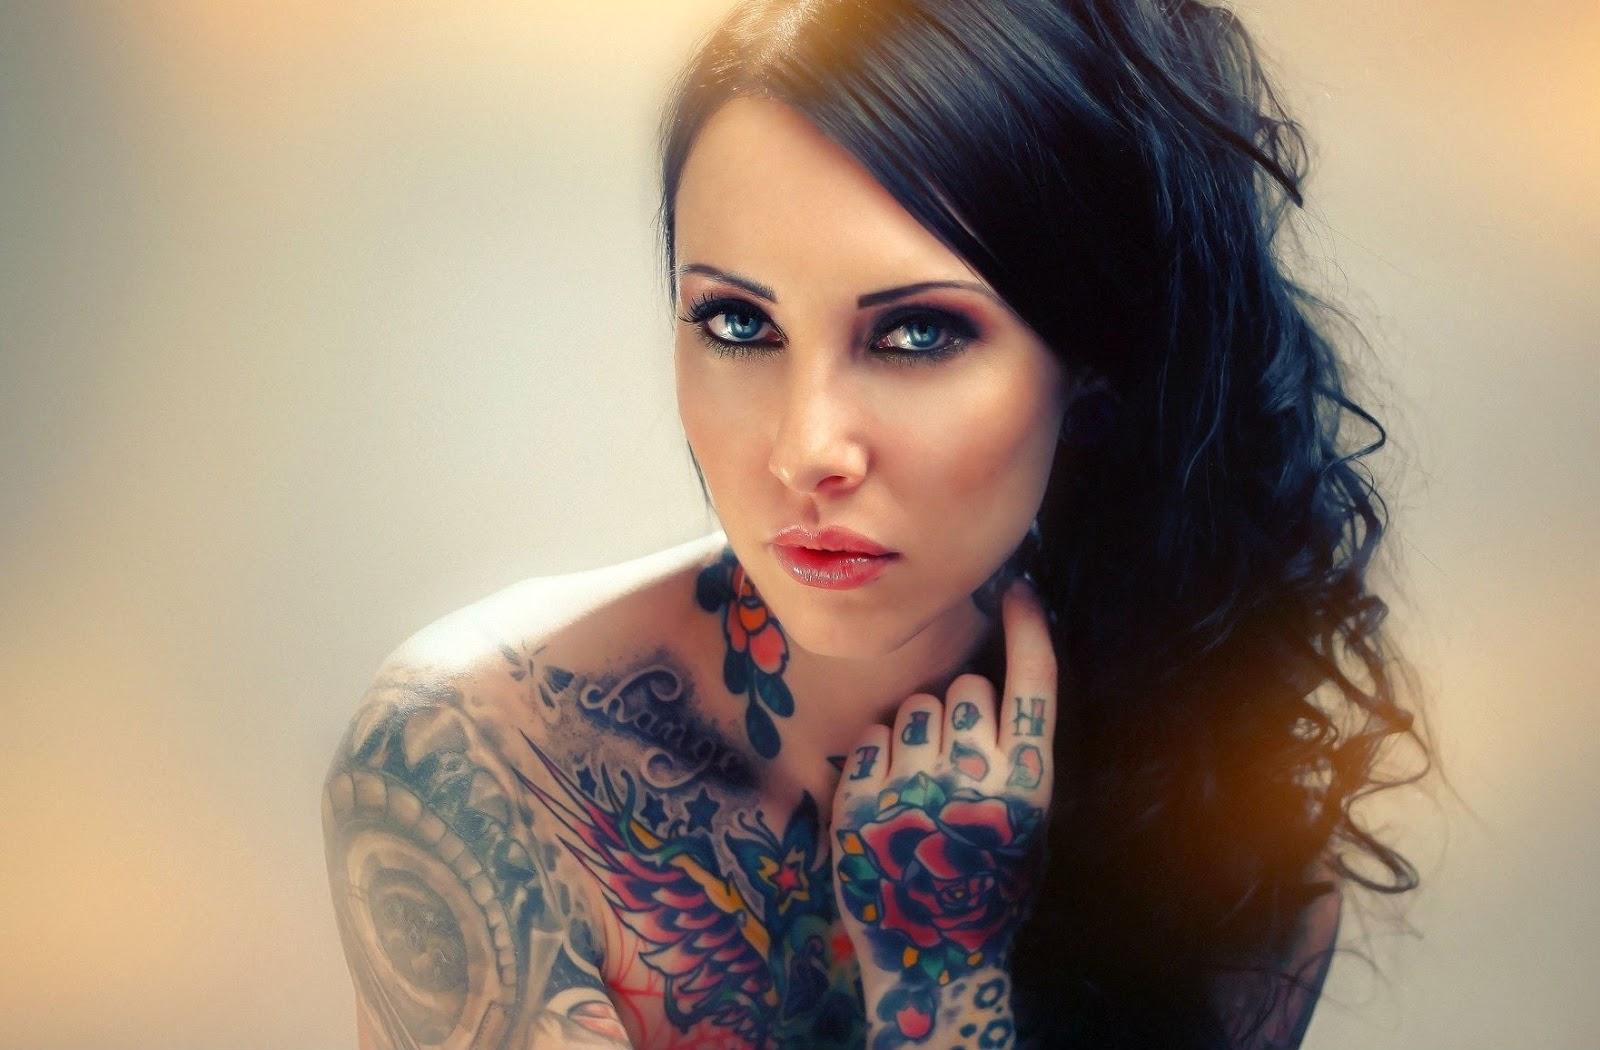 Tatuajul: O cale deschisa catre infectii